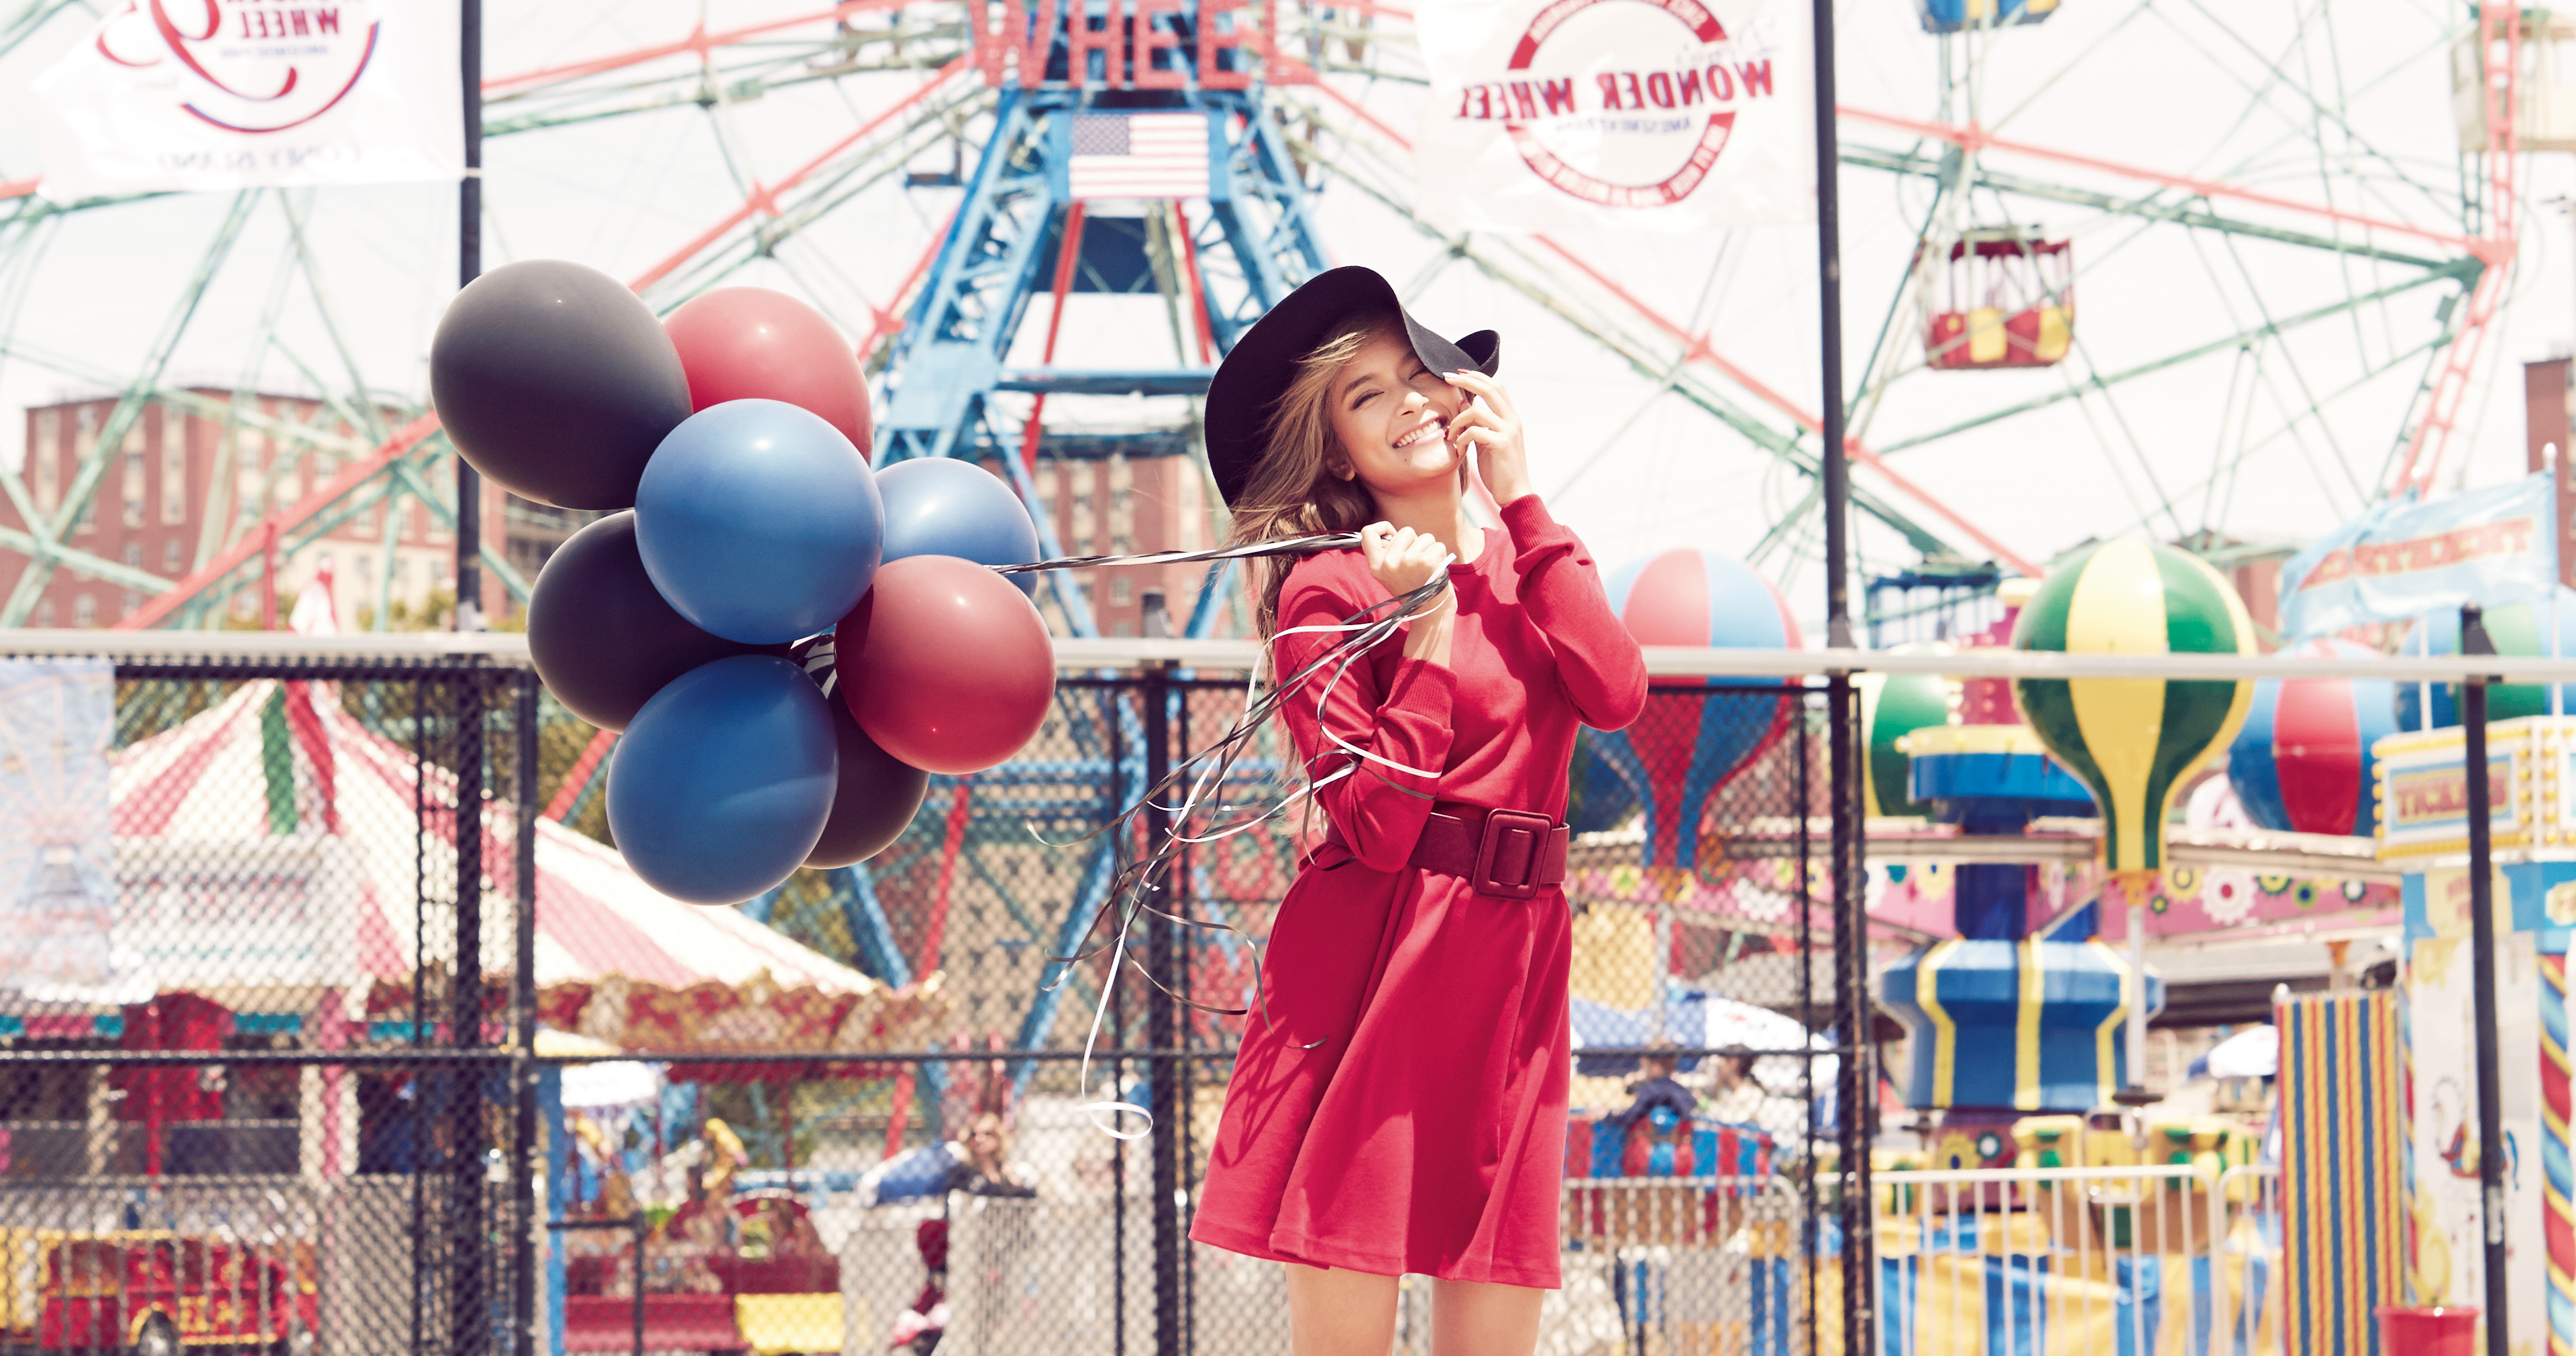 Peach John Japanese Advertising Campaign Coney Island - Model Rola I Greg Sorensen I Fashion & Beauty Photographer I NYC